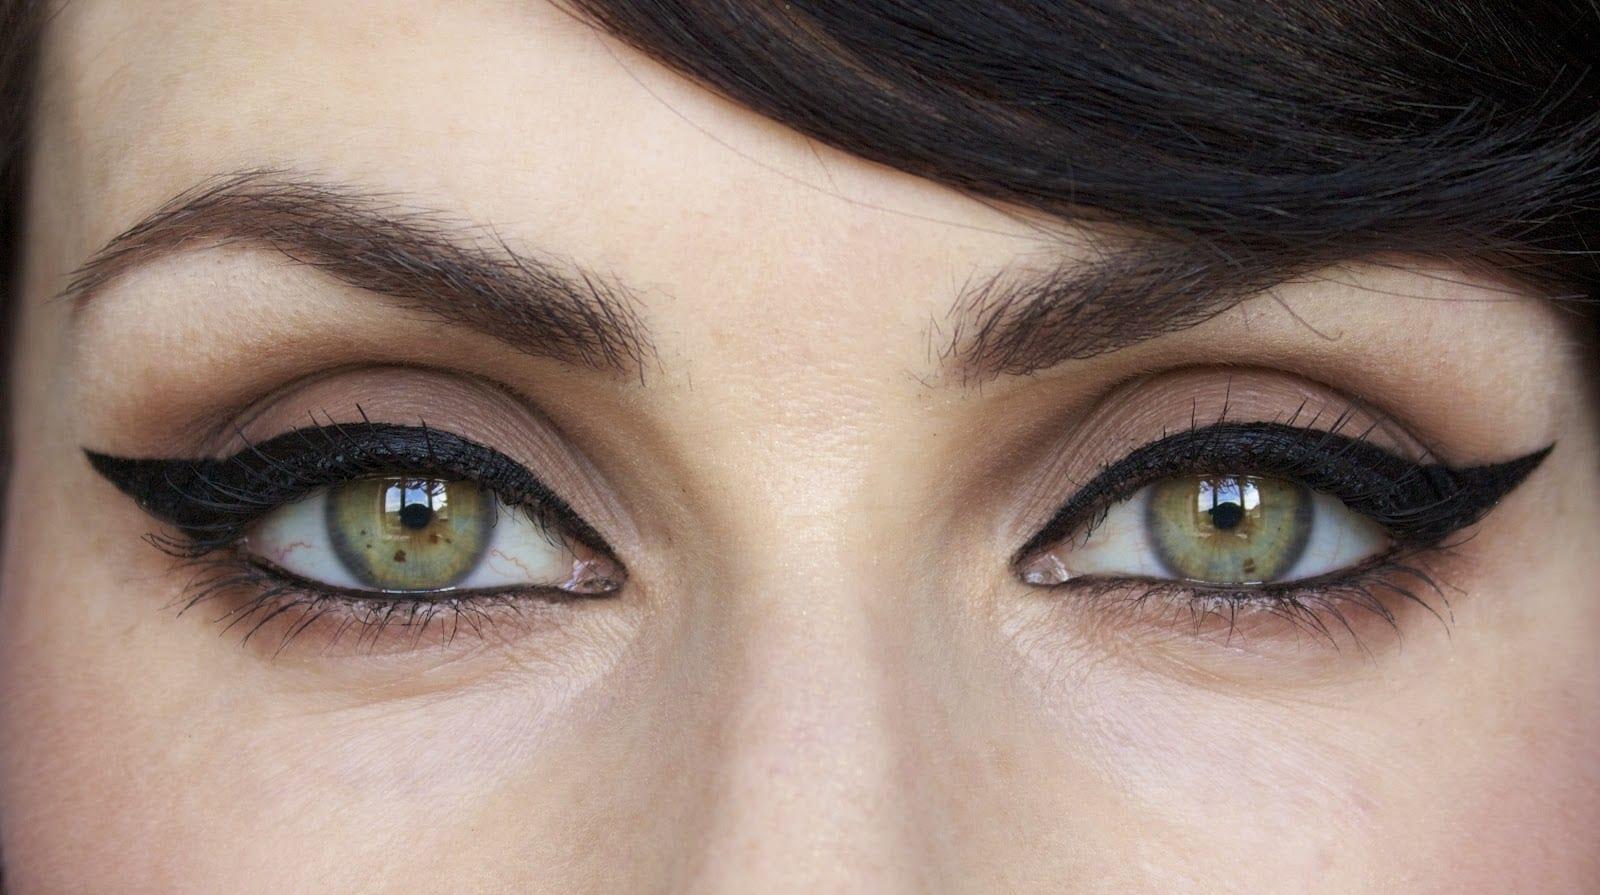 eyeliner eye साठी प्रतिमा परिणाम